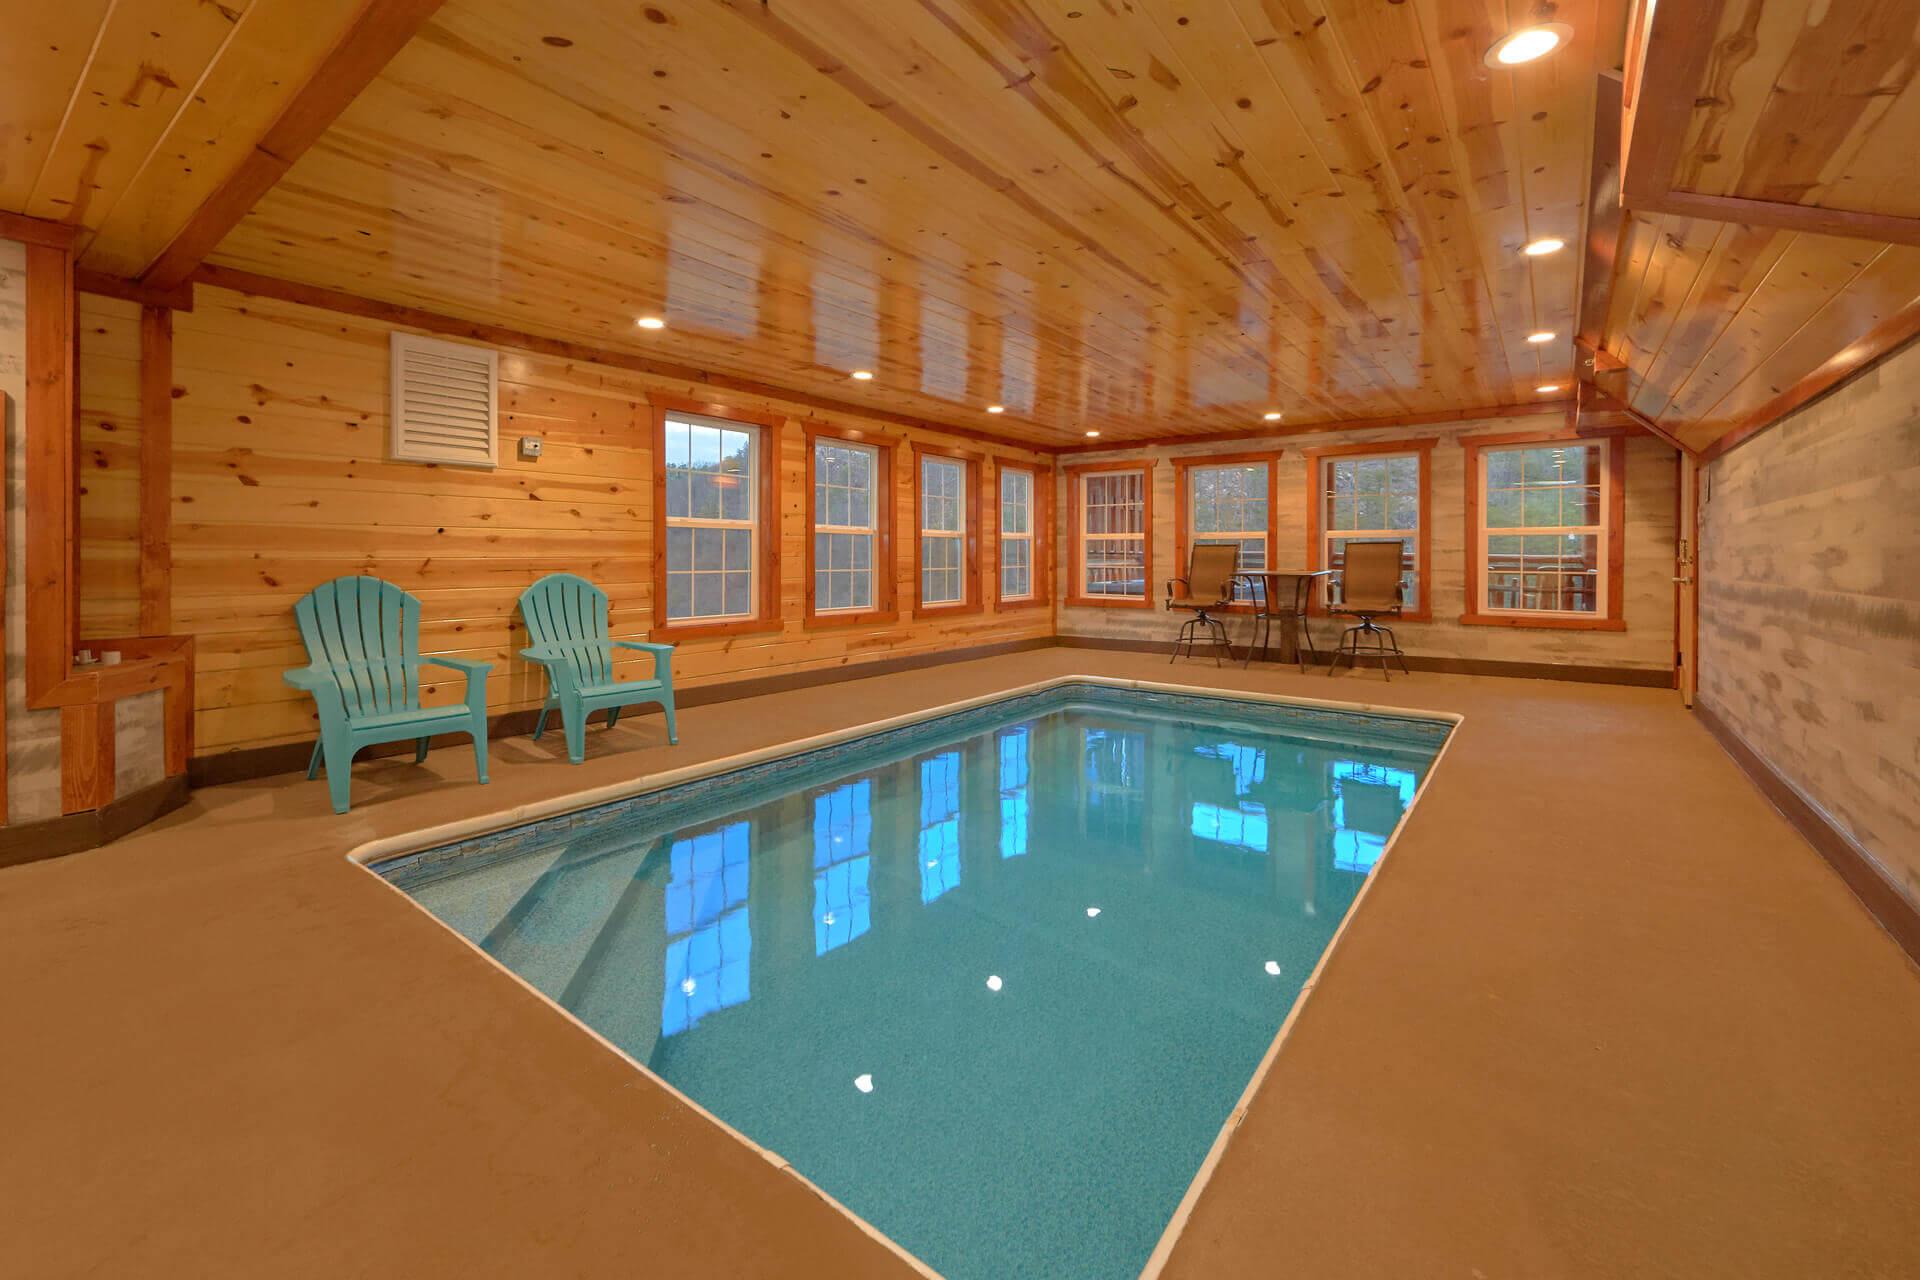 Marvelous Indoor Pool Cabin With Theater Room Interior Design Ideas Gentotthenellocom